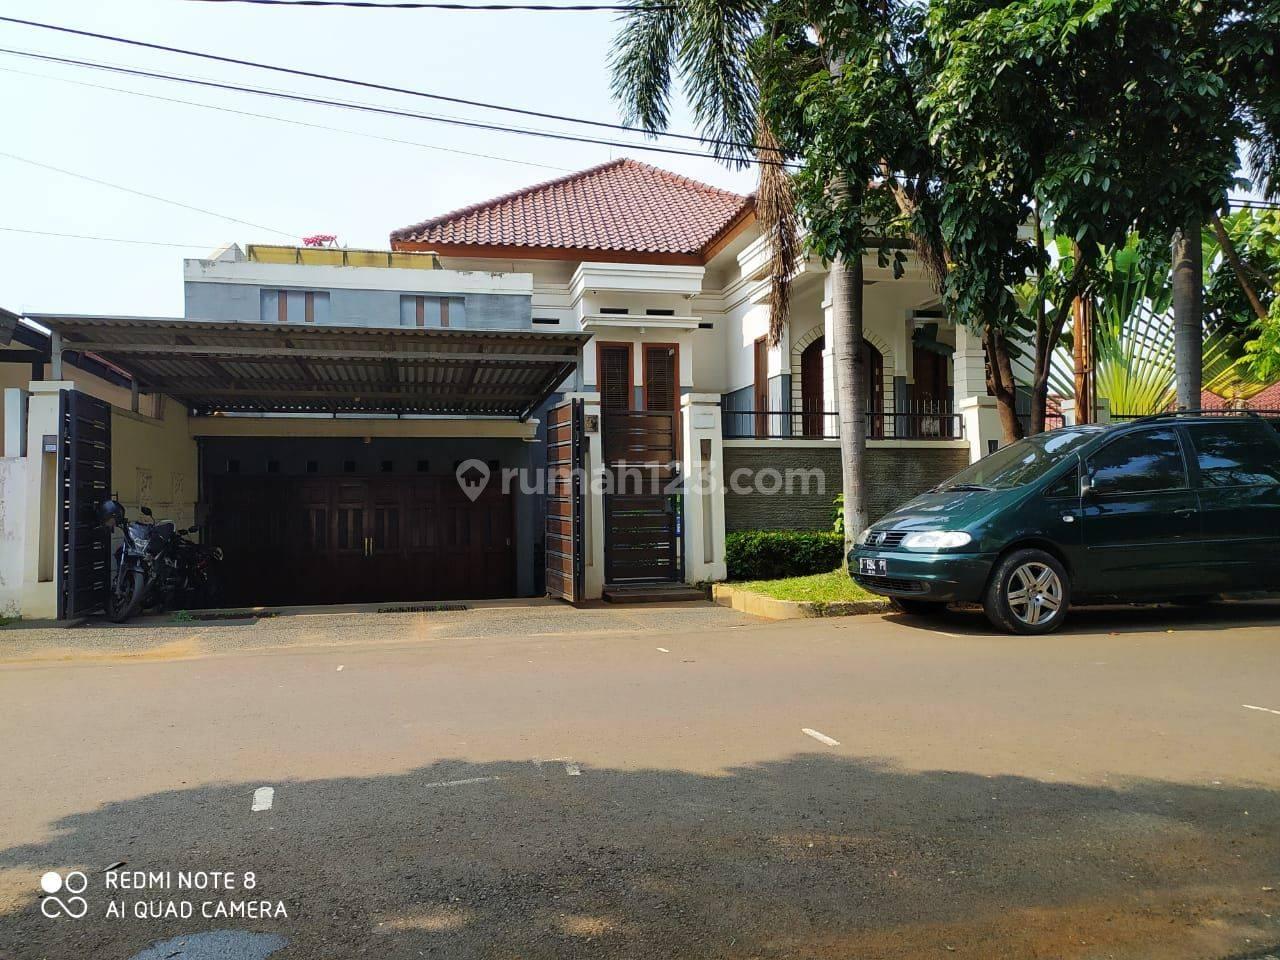 Rumah Mewah di Jln Taman Margasatwa Jati Padang Jakarta Selatan